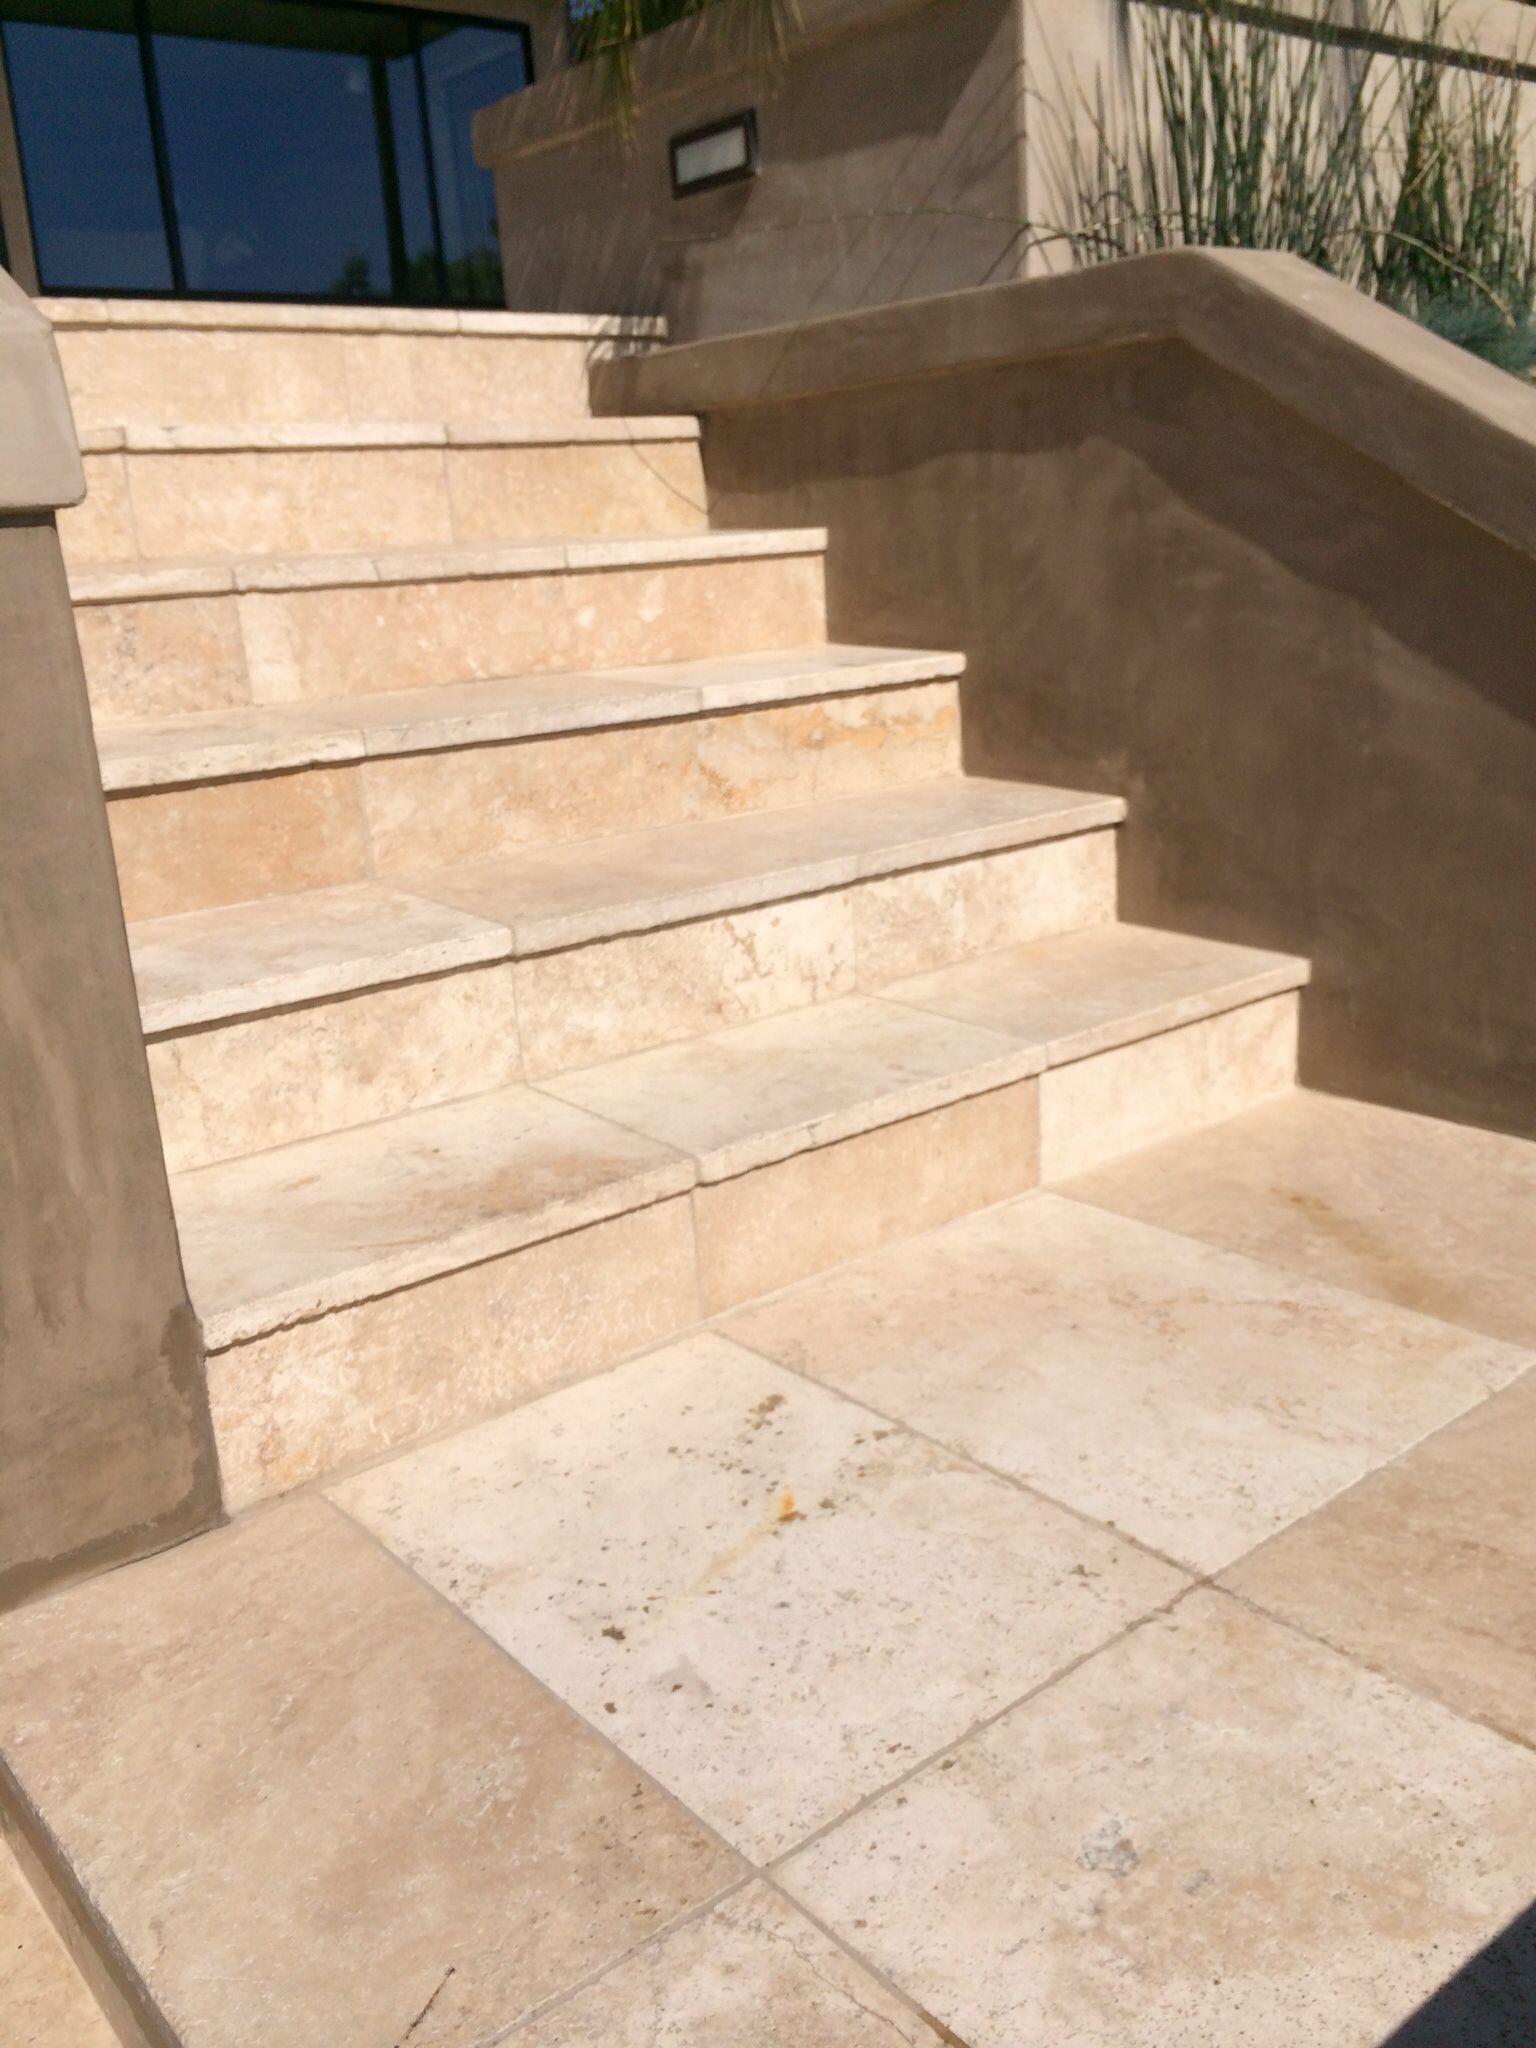 Travertine stairs | Home ideas | Pinterest | Travertine ...